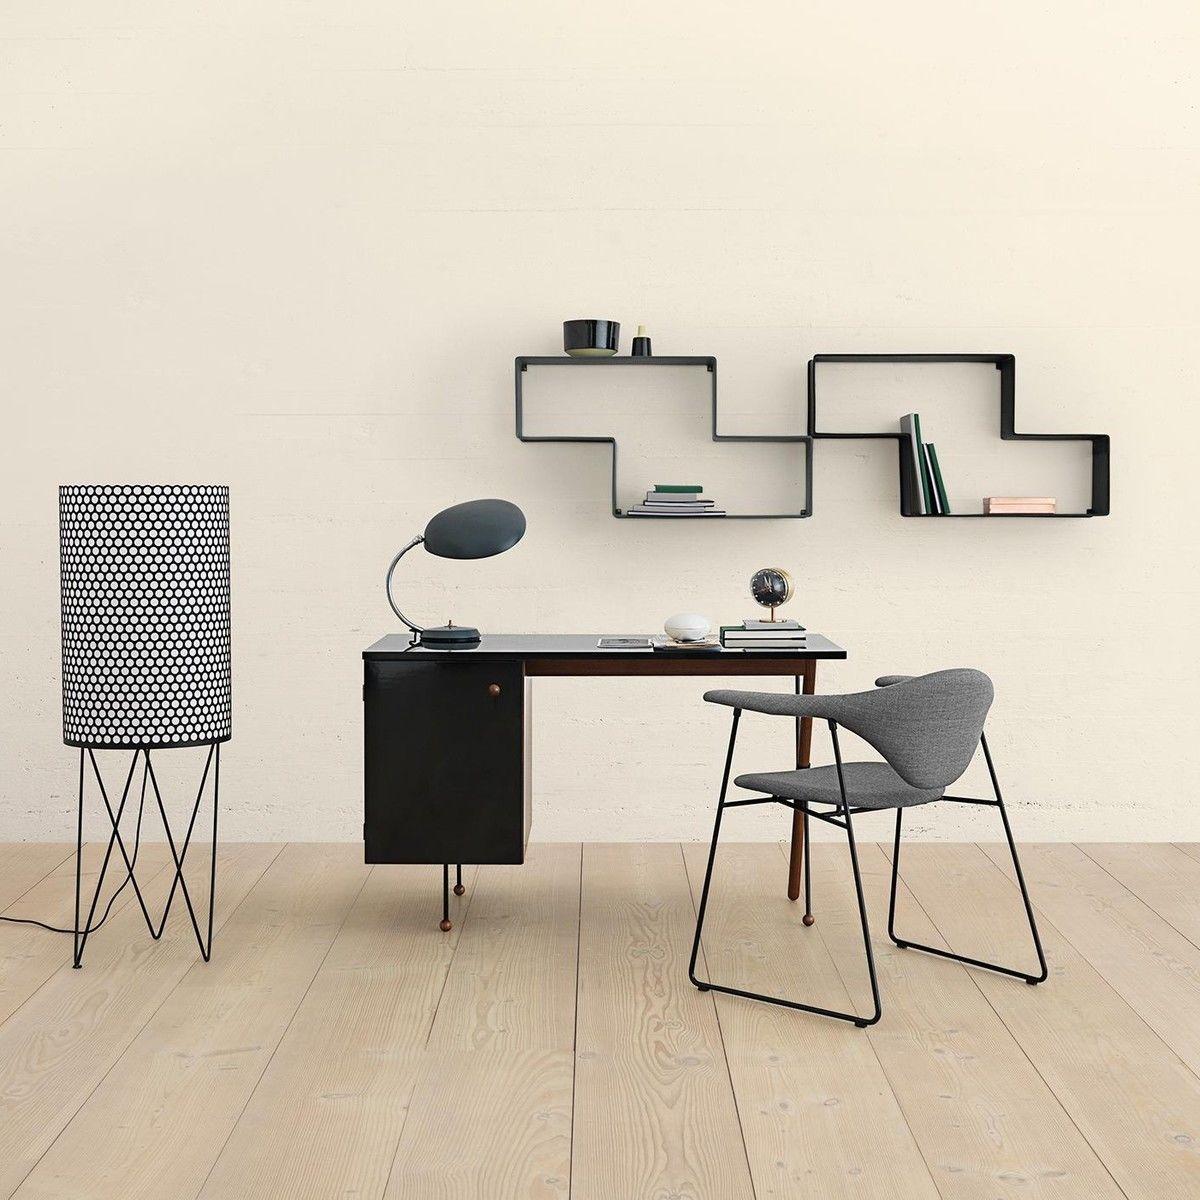 gubi grossman 62 series schreibtisch gubi. Black Bedroom Furniture Sets. Home Design Ideas